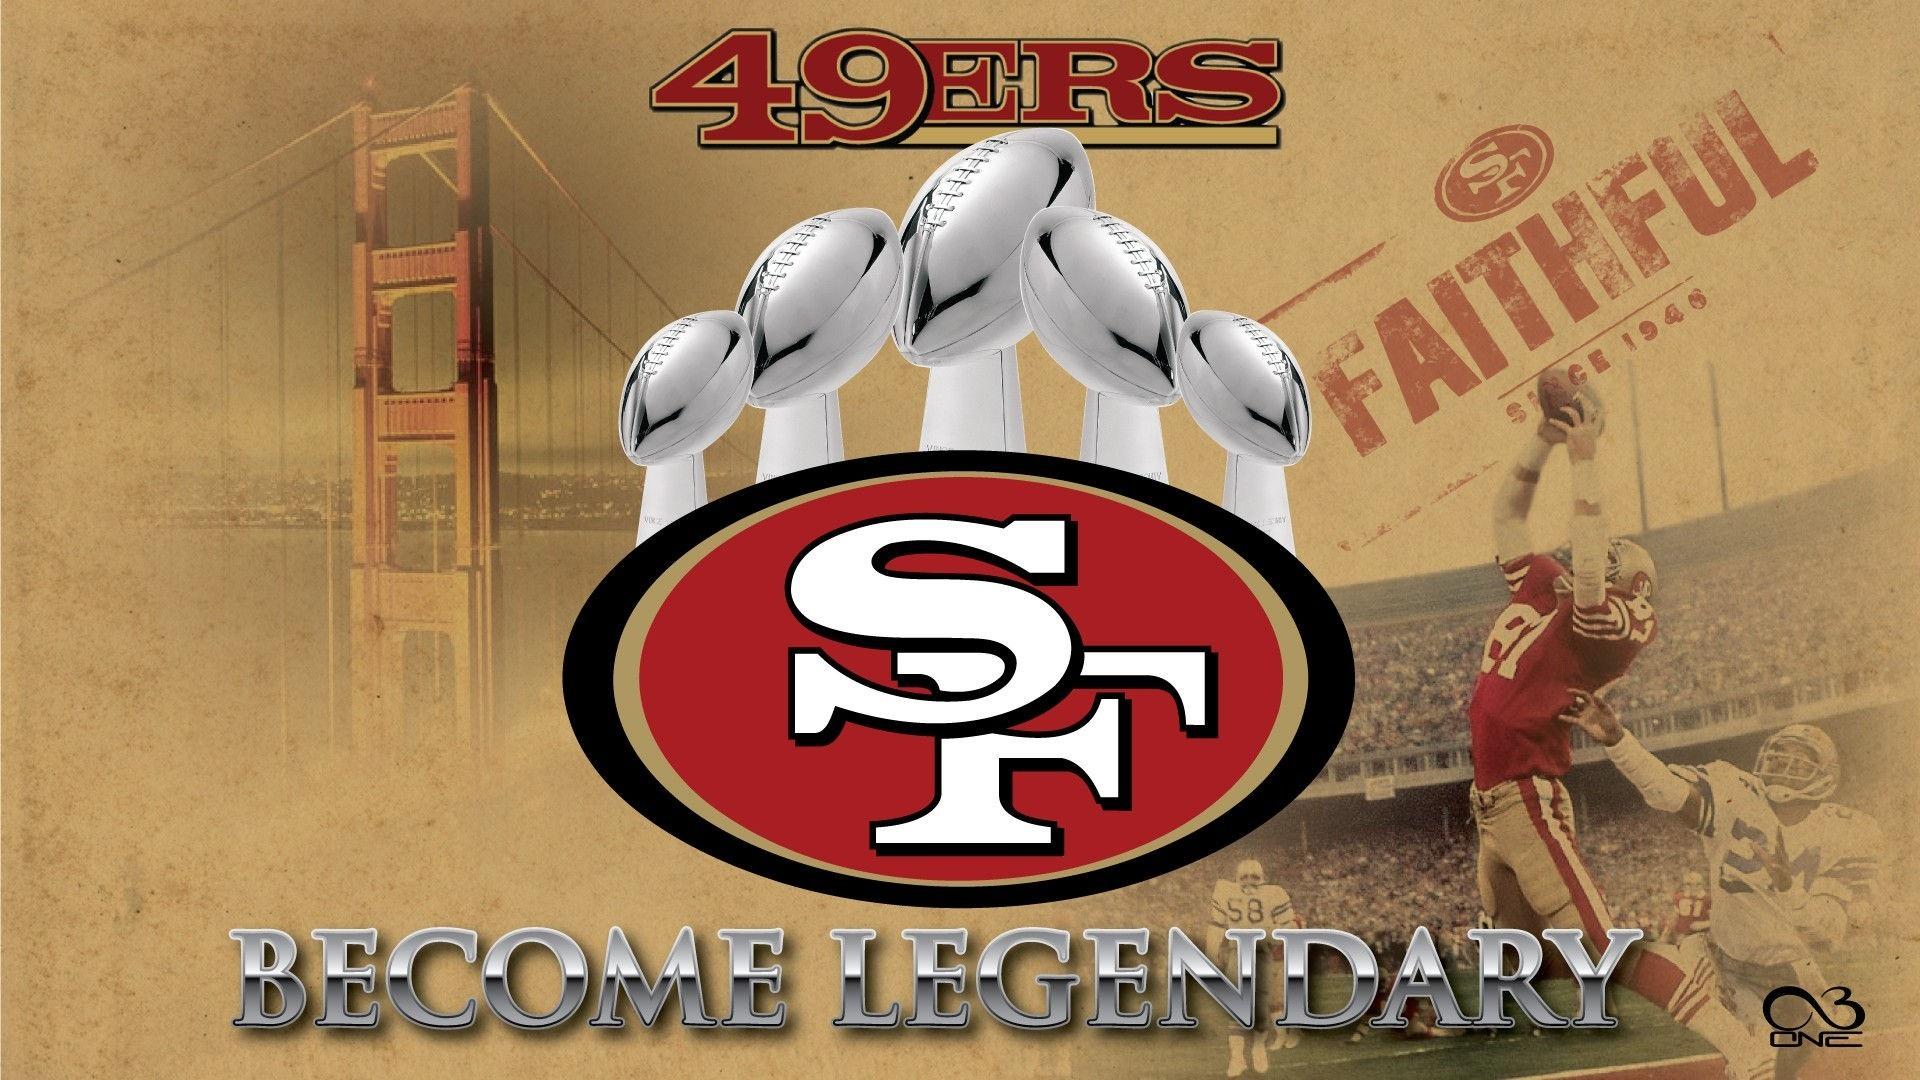 San Francisco 49ers Wallpaper For Mac Backgrounds 2020 NFL 1920x1080